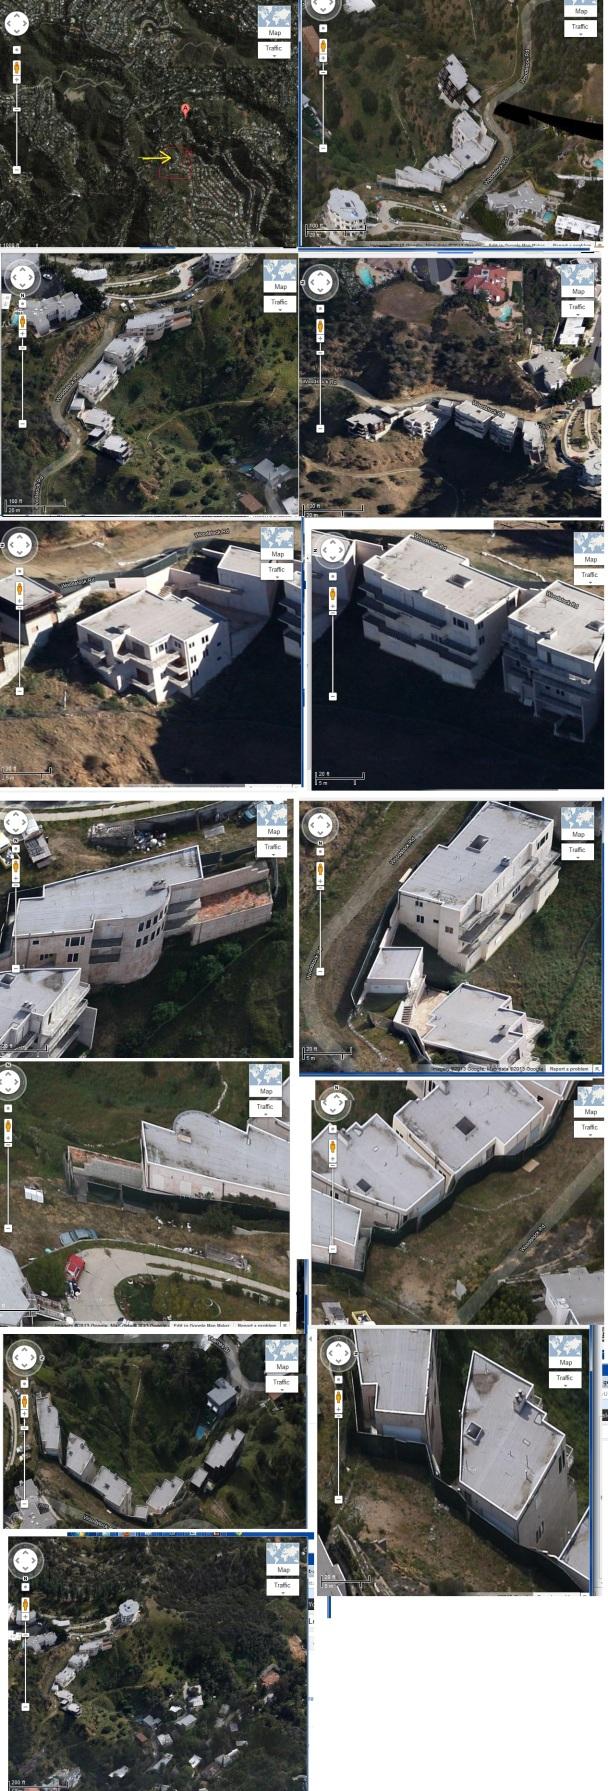 5 ABANDONED HOUSES